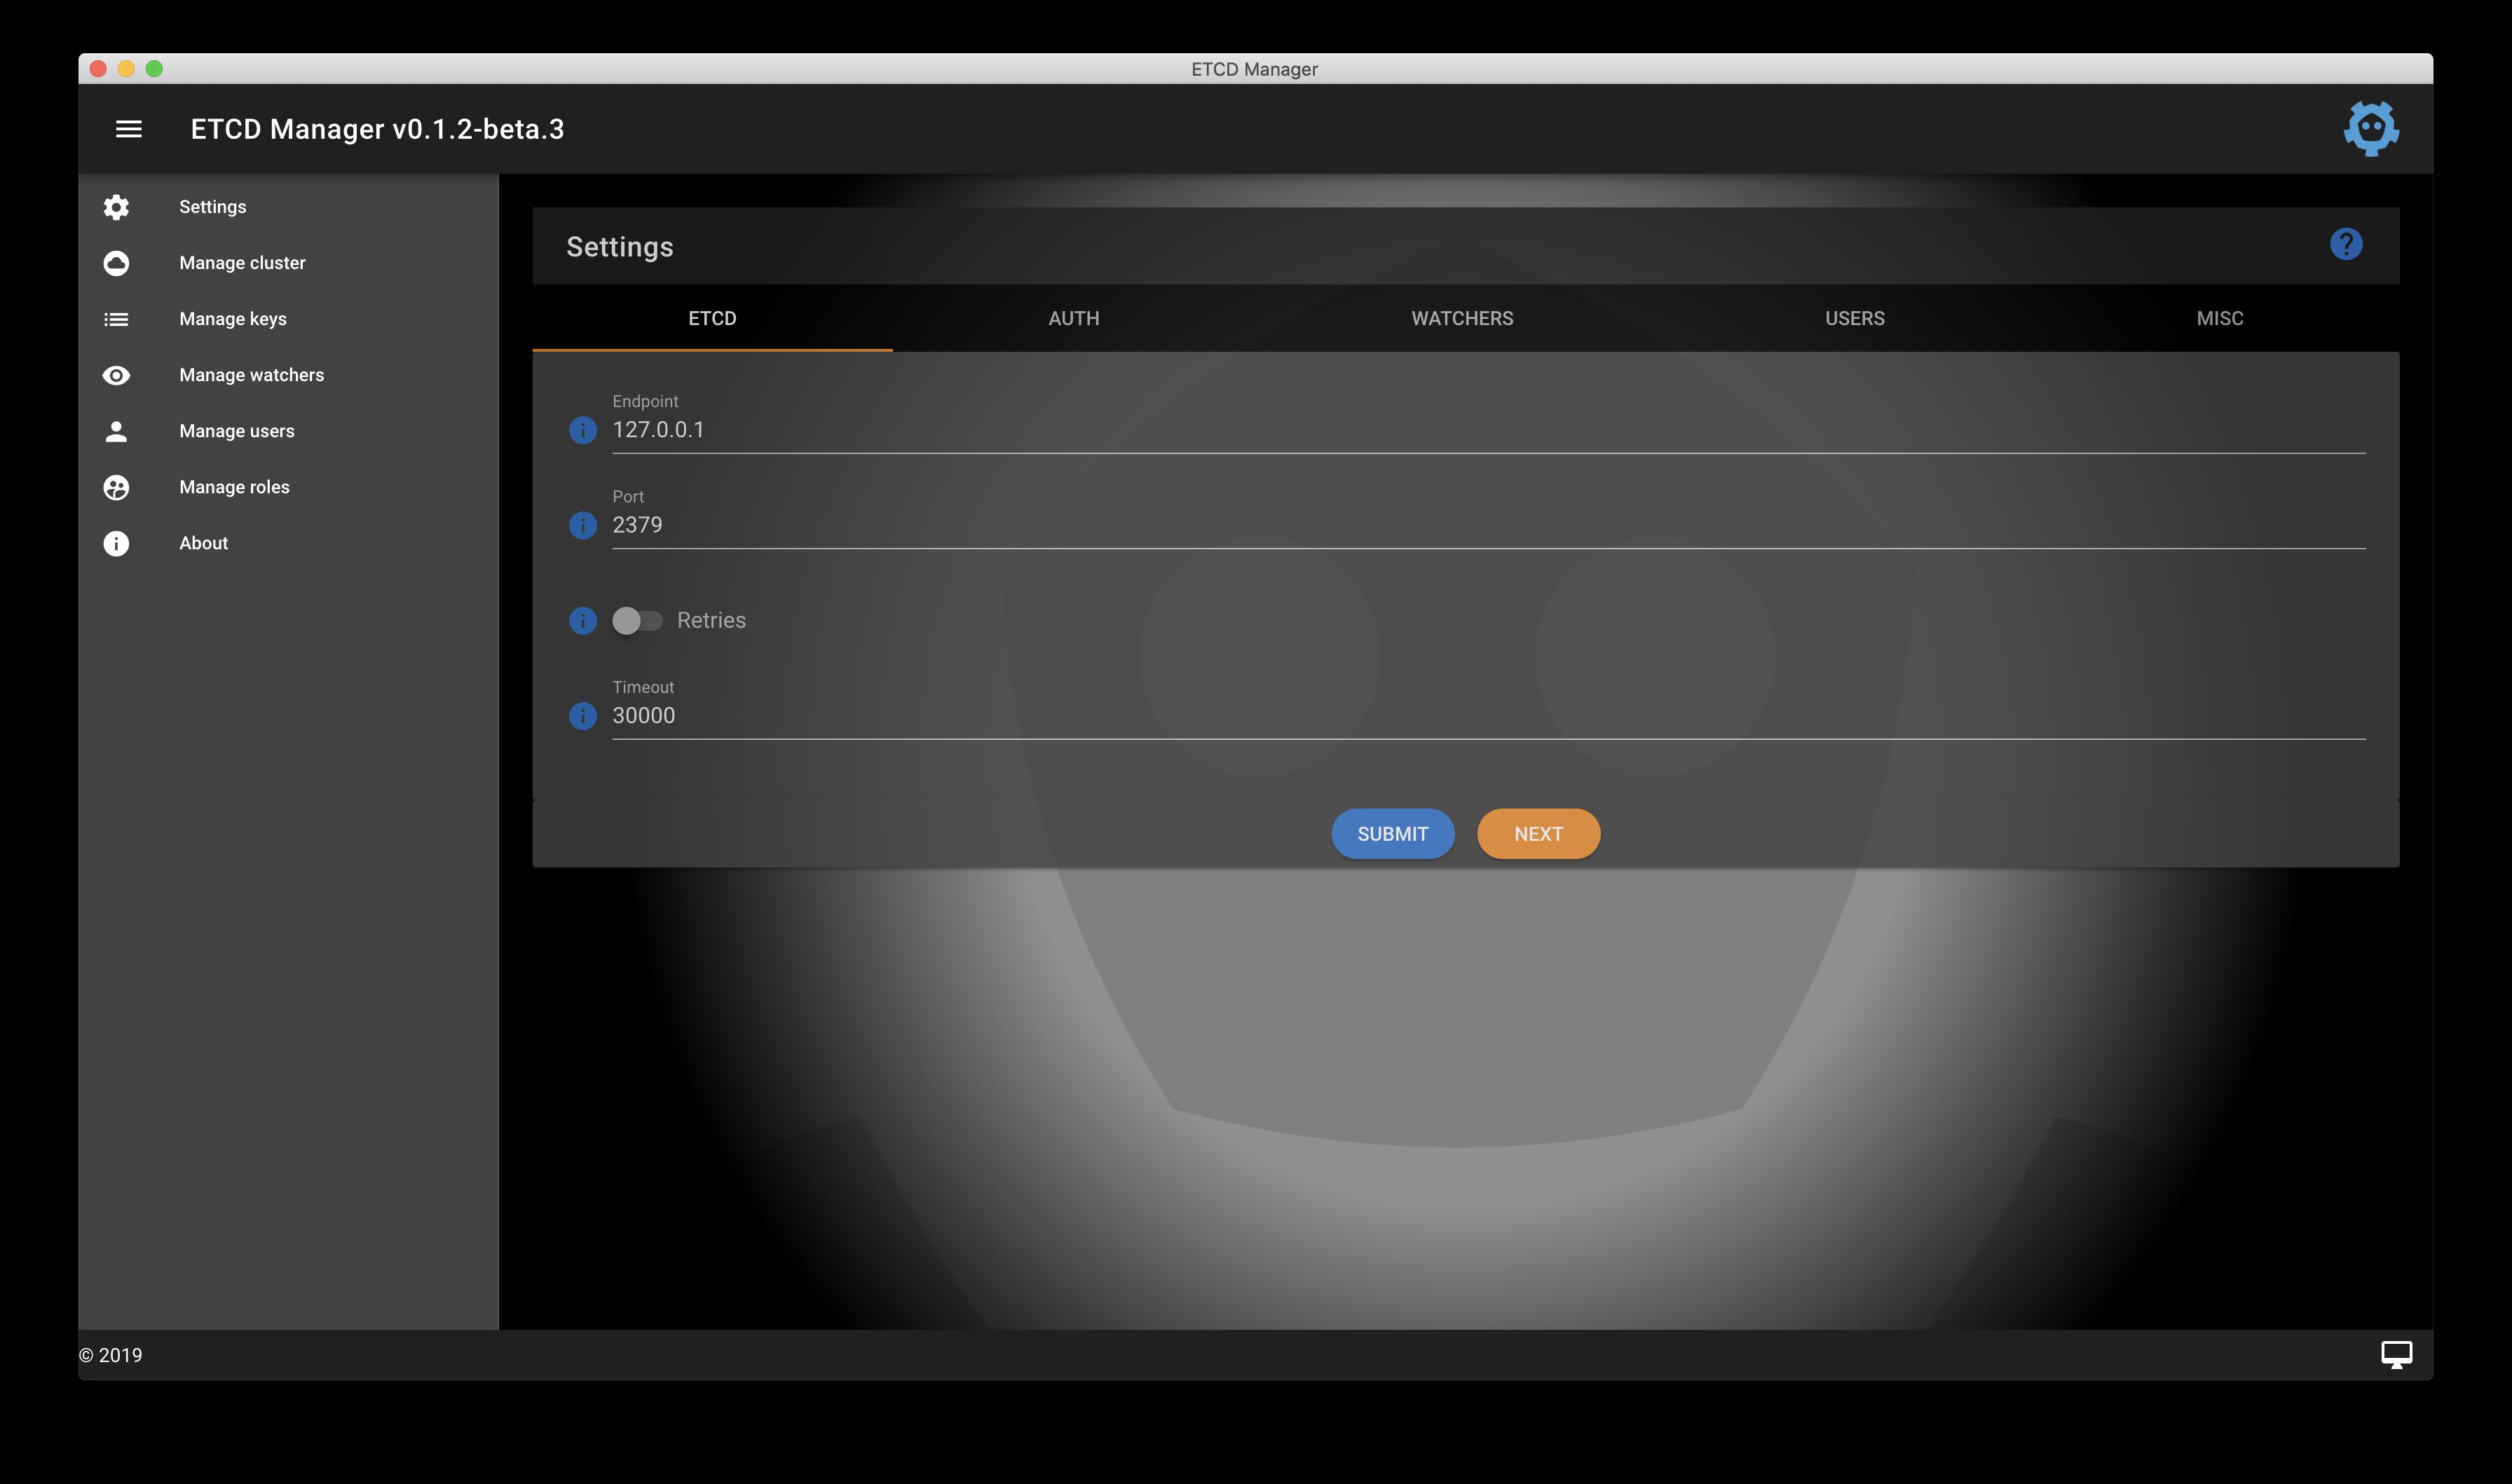 The settings screen